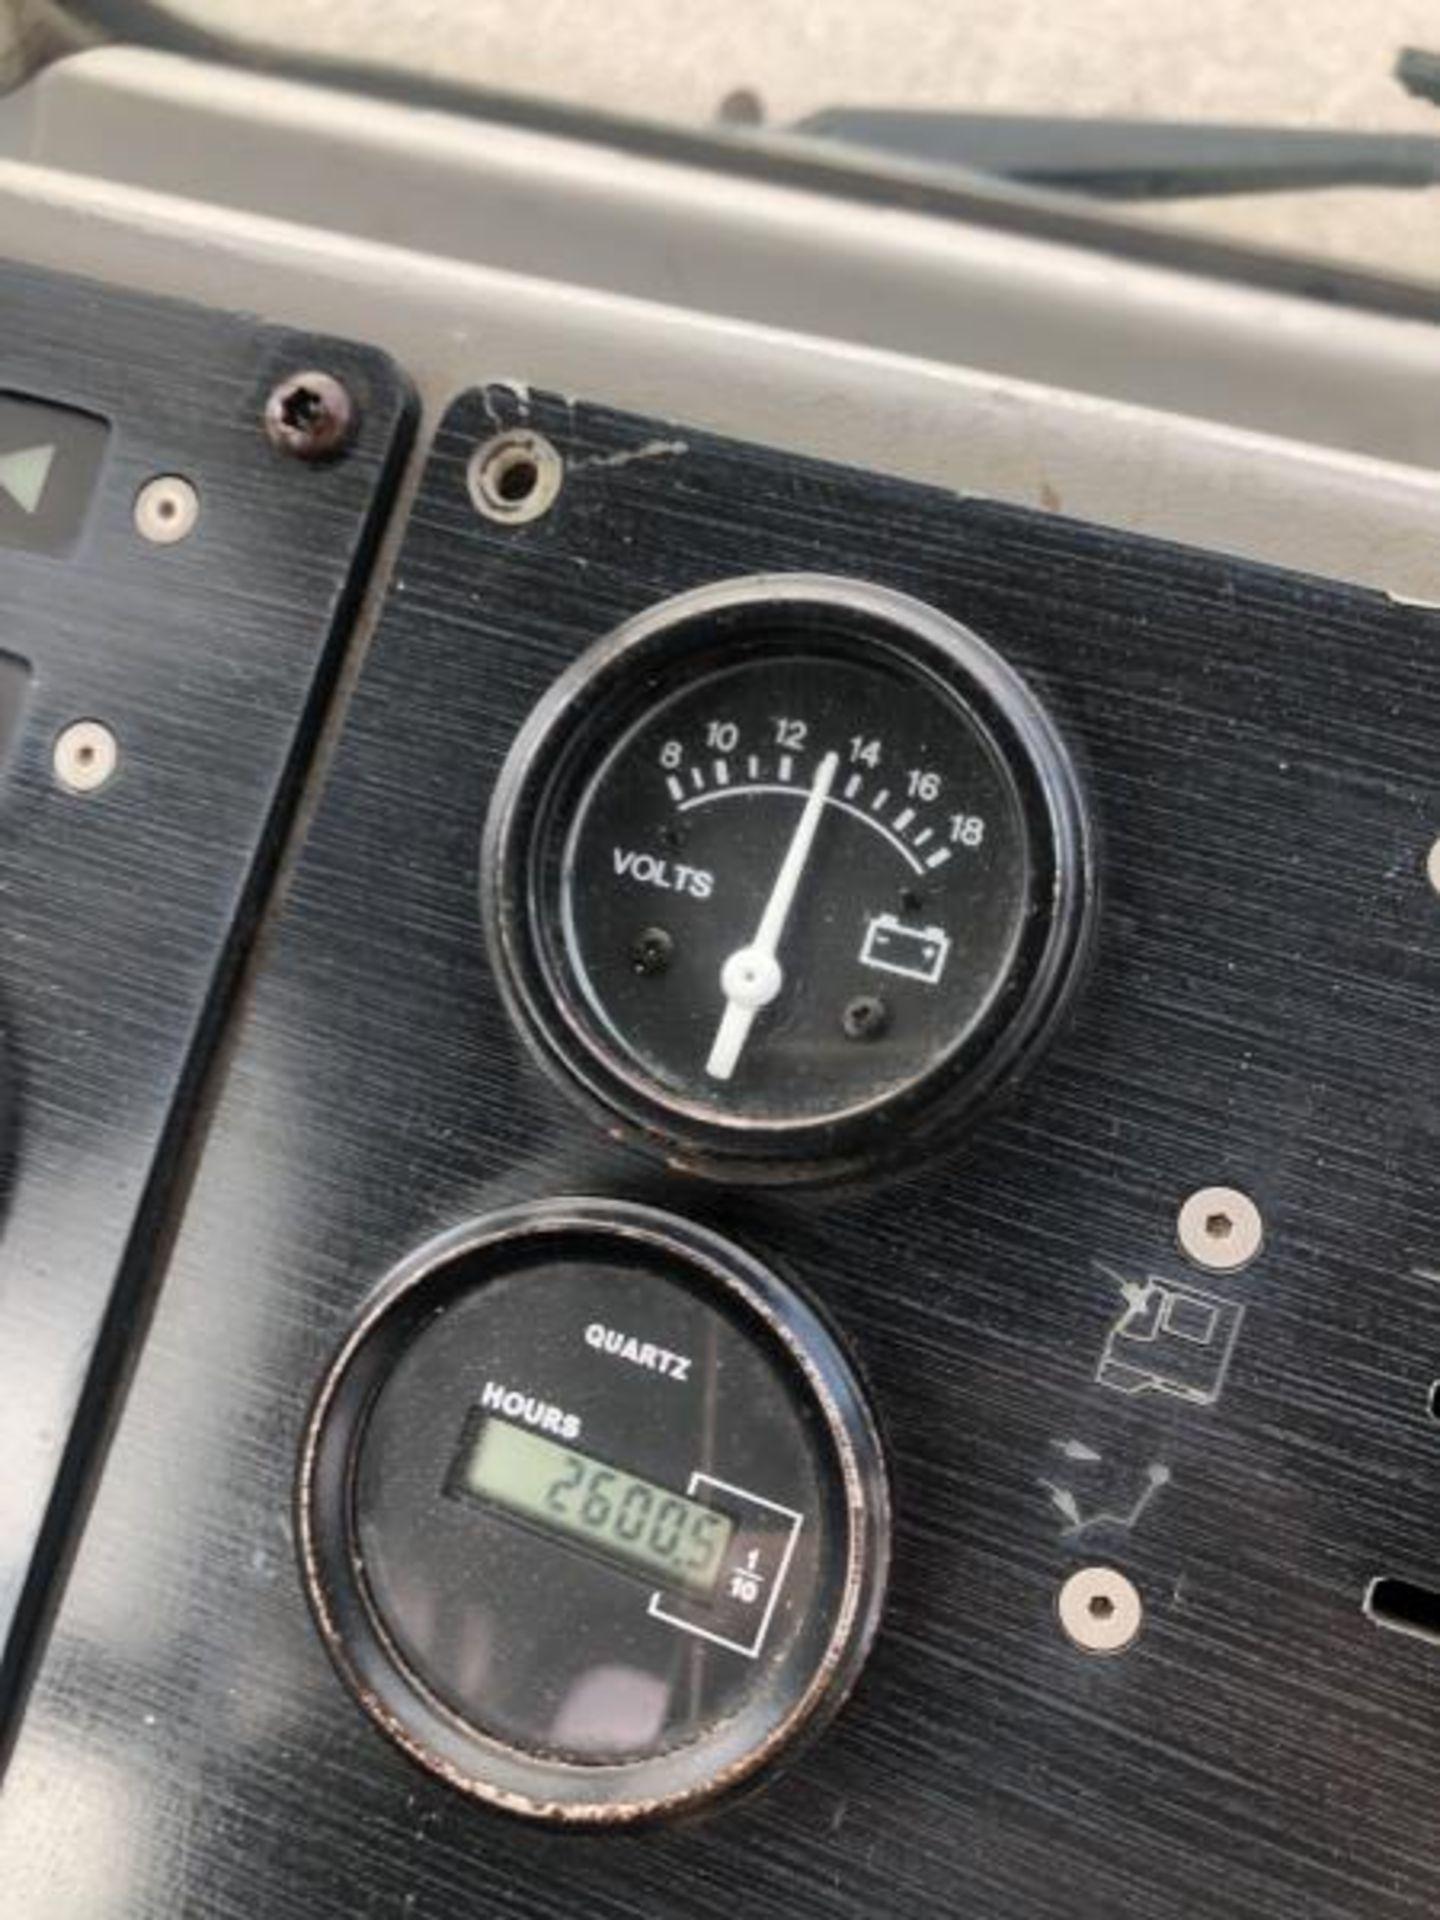 2015 Kalmar Ottawa 4x2 Yard Truck , SN: 338845 2,600.5 Hours, 185 Miles - Image 18 of 27